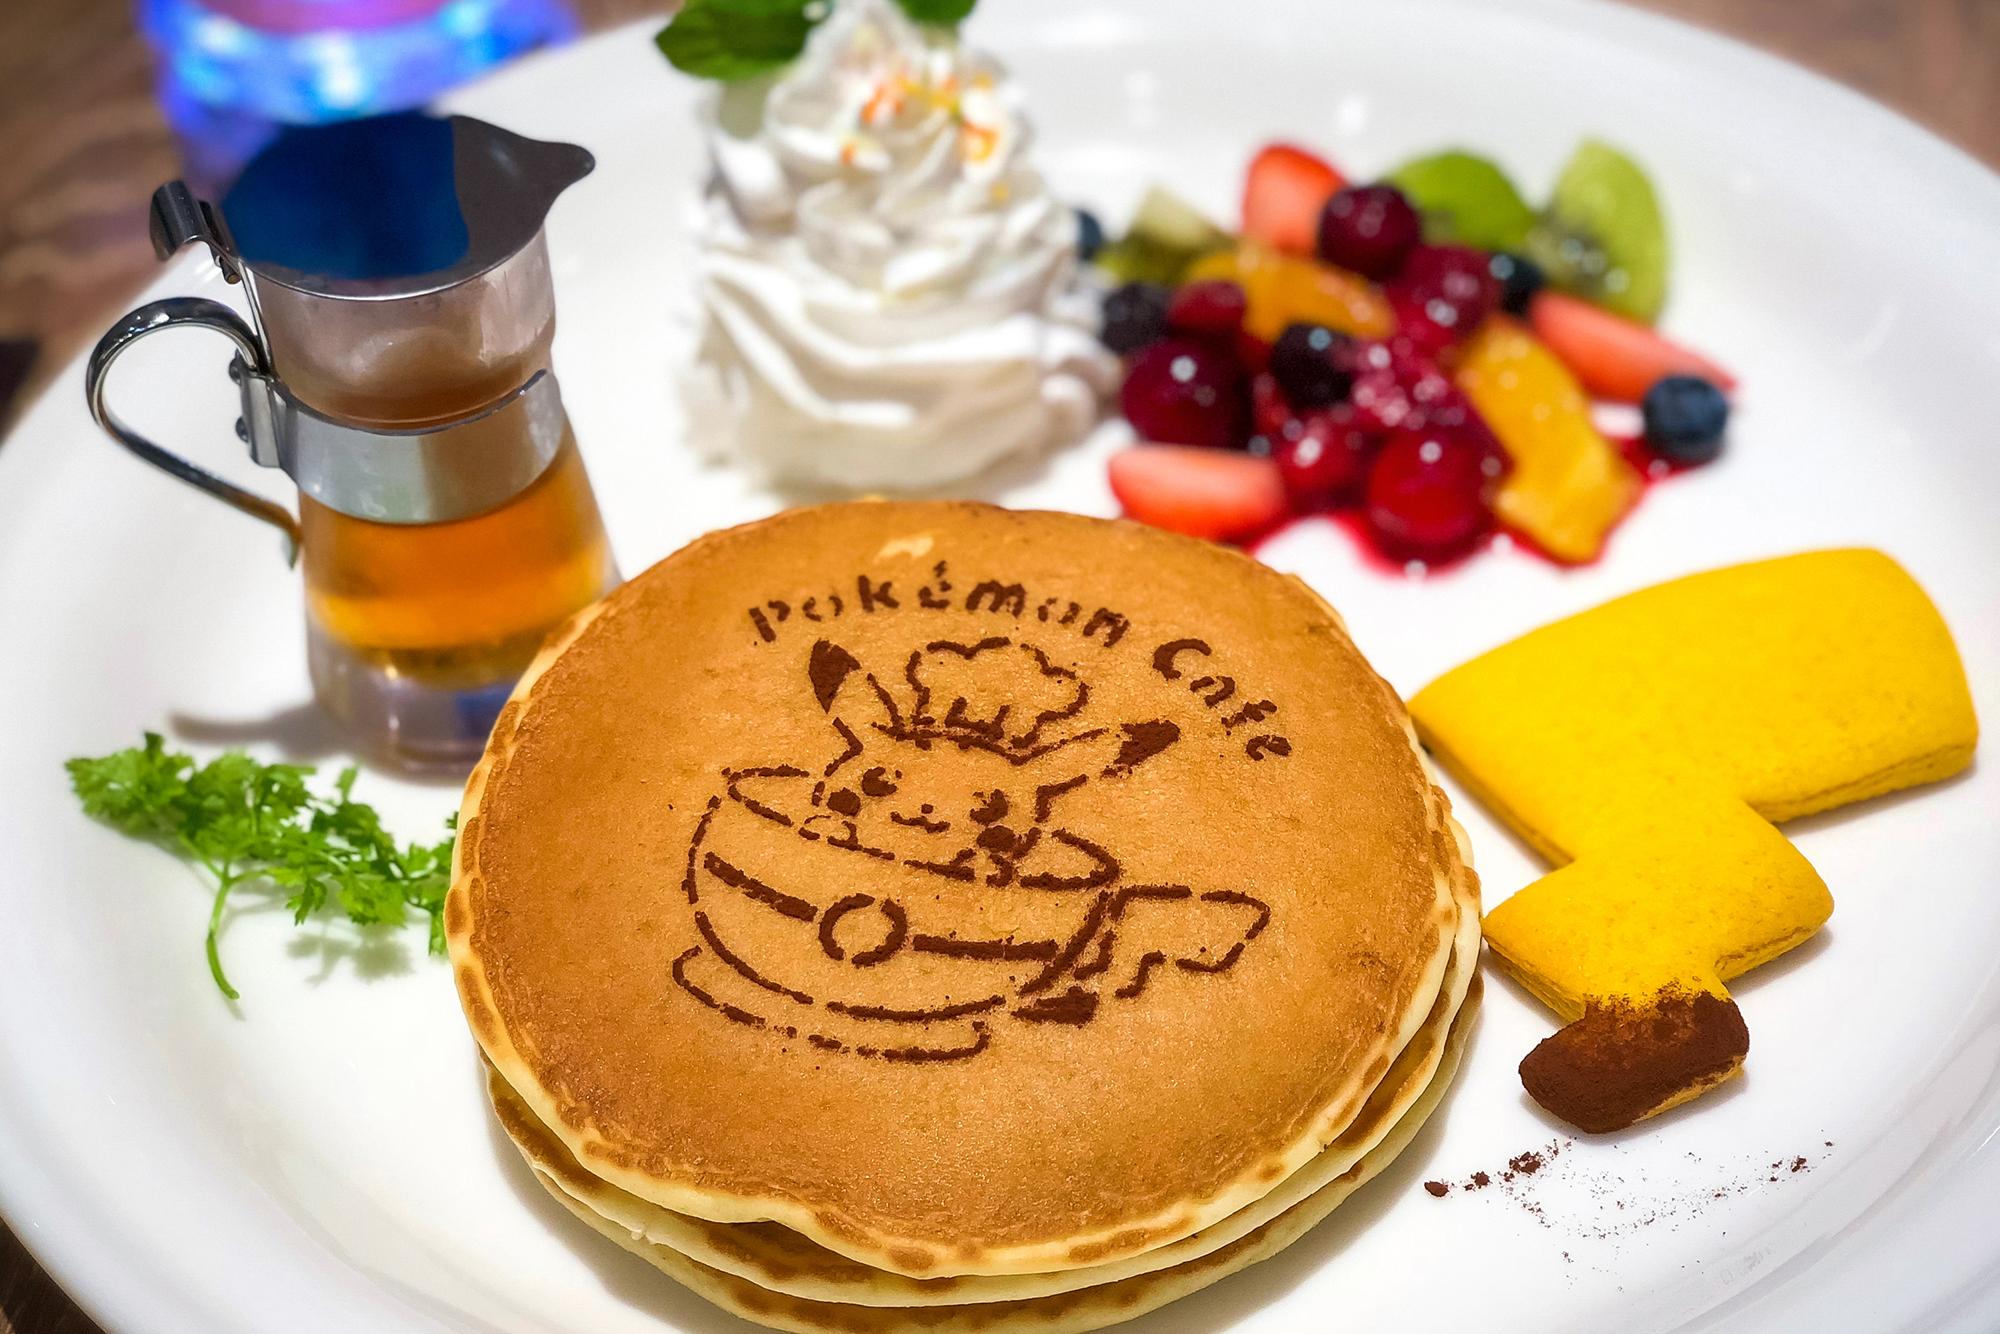 Pikachu pancakes at Pokémon Café.